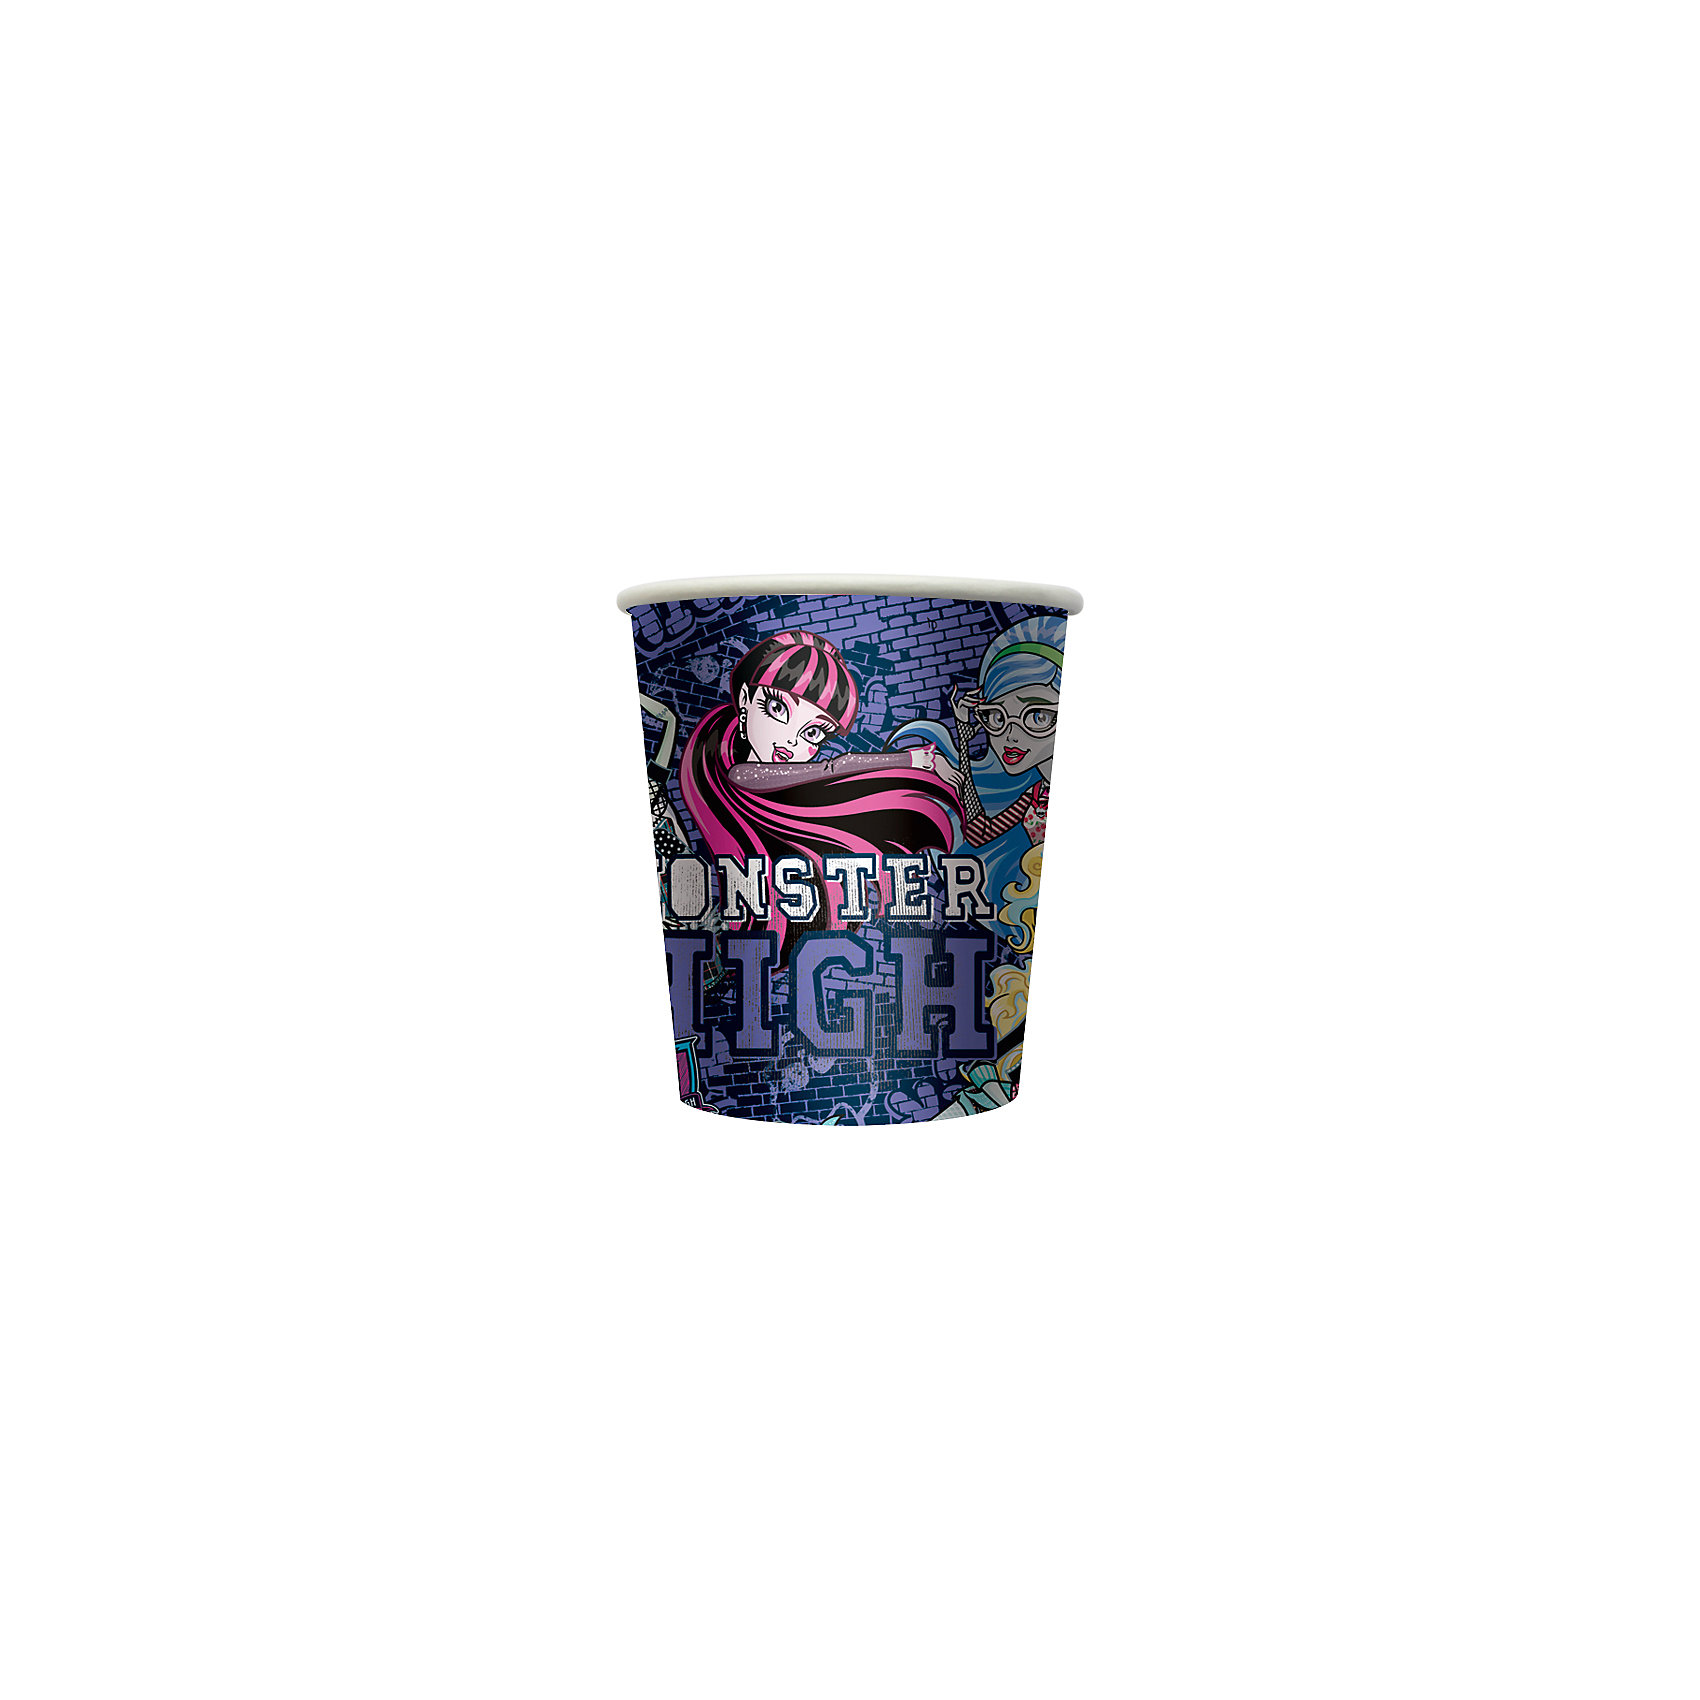 Росмэн Стакан бумажный Граффити. Monster High (10 шт) росмэн наклейки 2 monster high